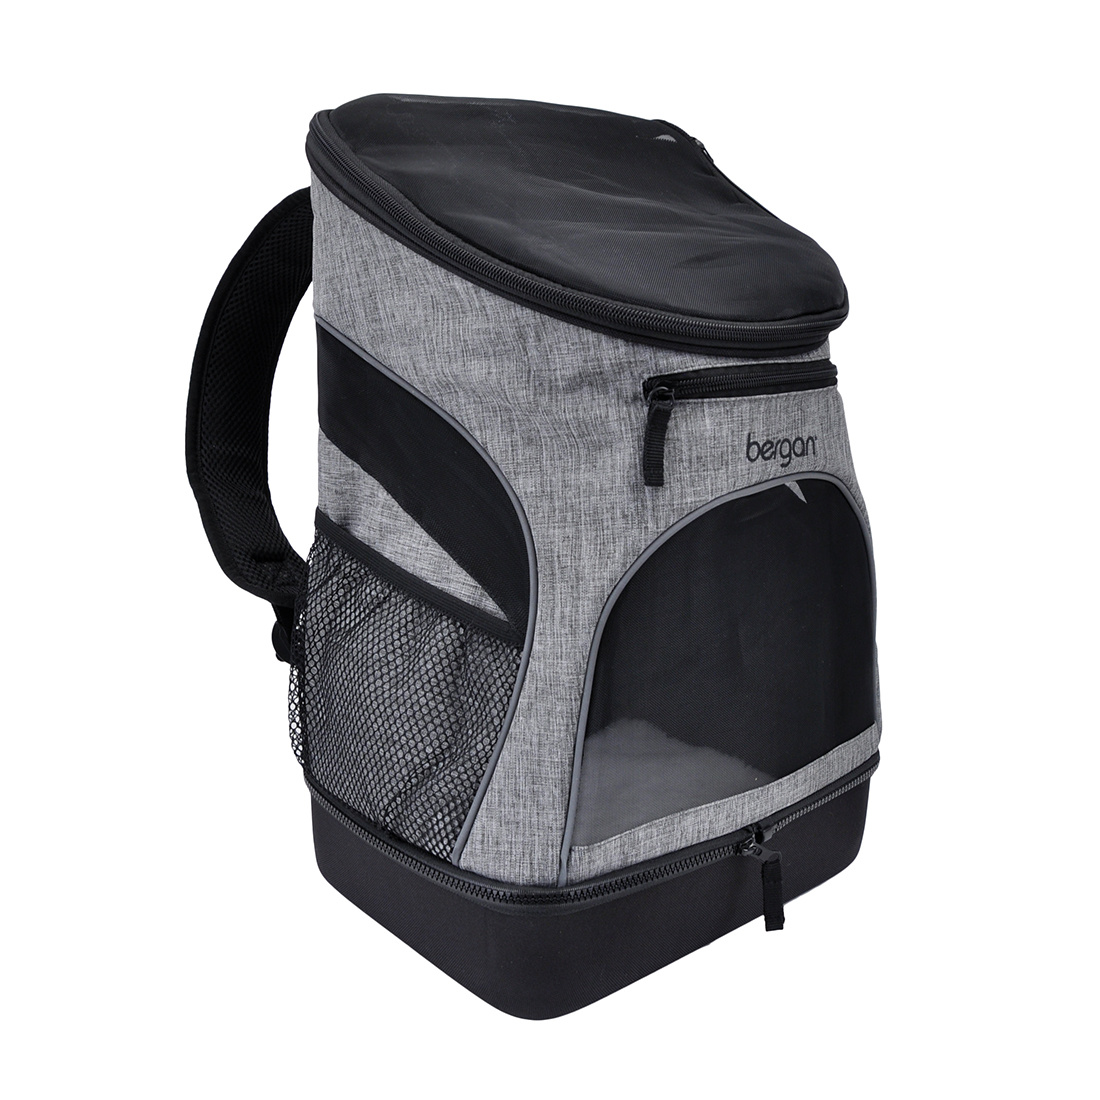 Coastal Bergan Backpack Pet Carrier